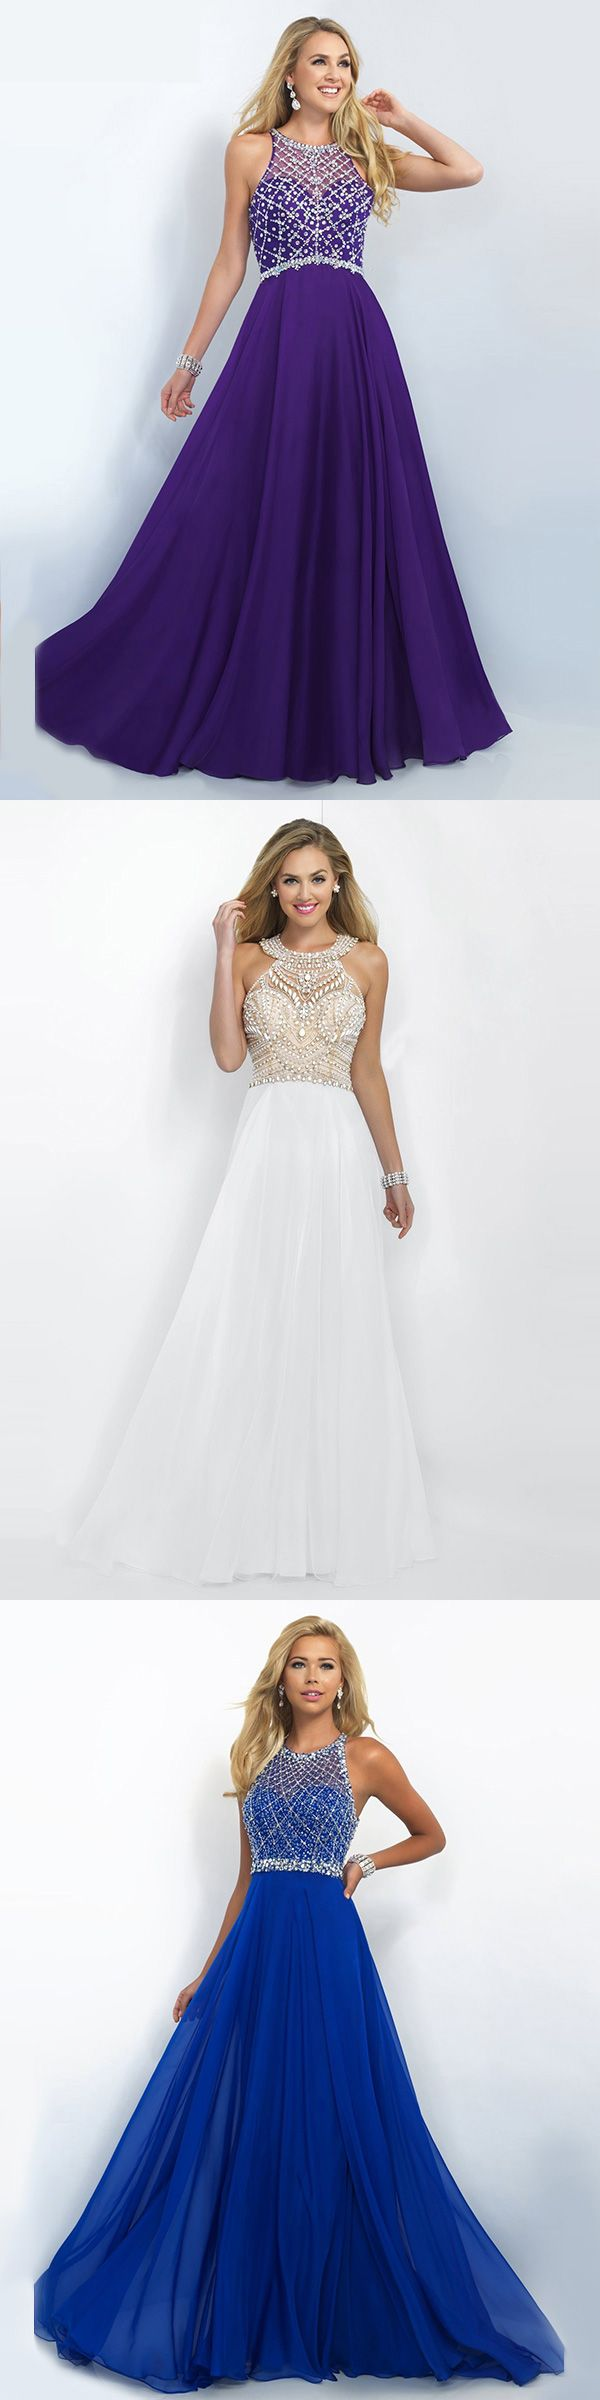 2016 New Styles of Prom Dresses via PromWill !!